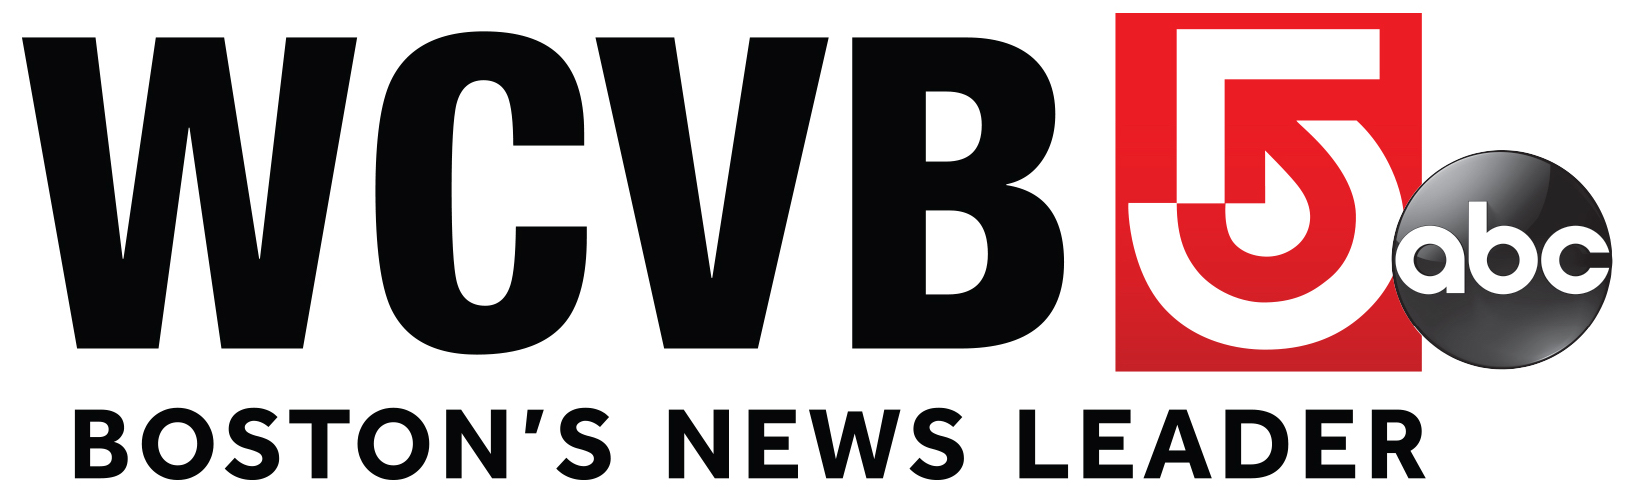 WCVB_BNL_h.jpg